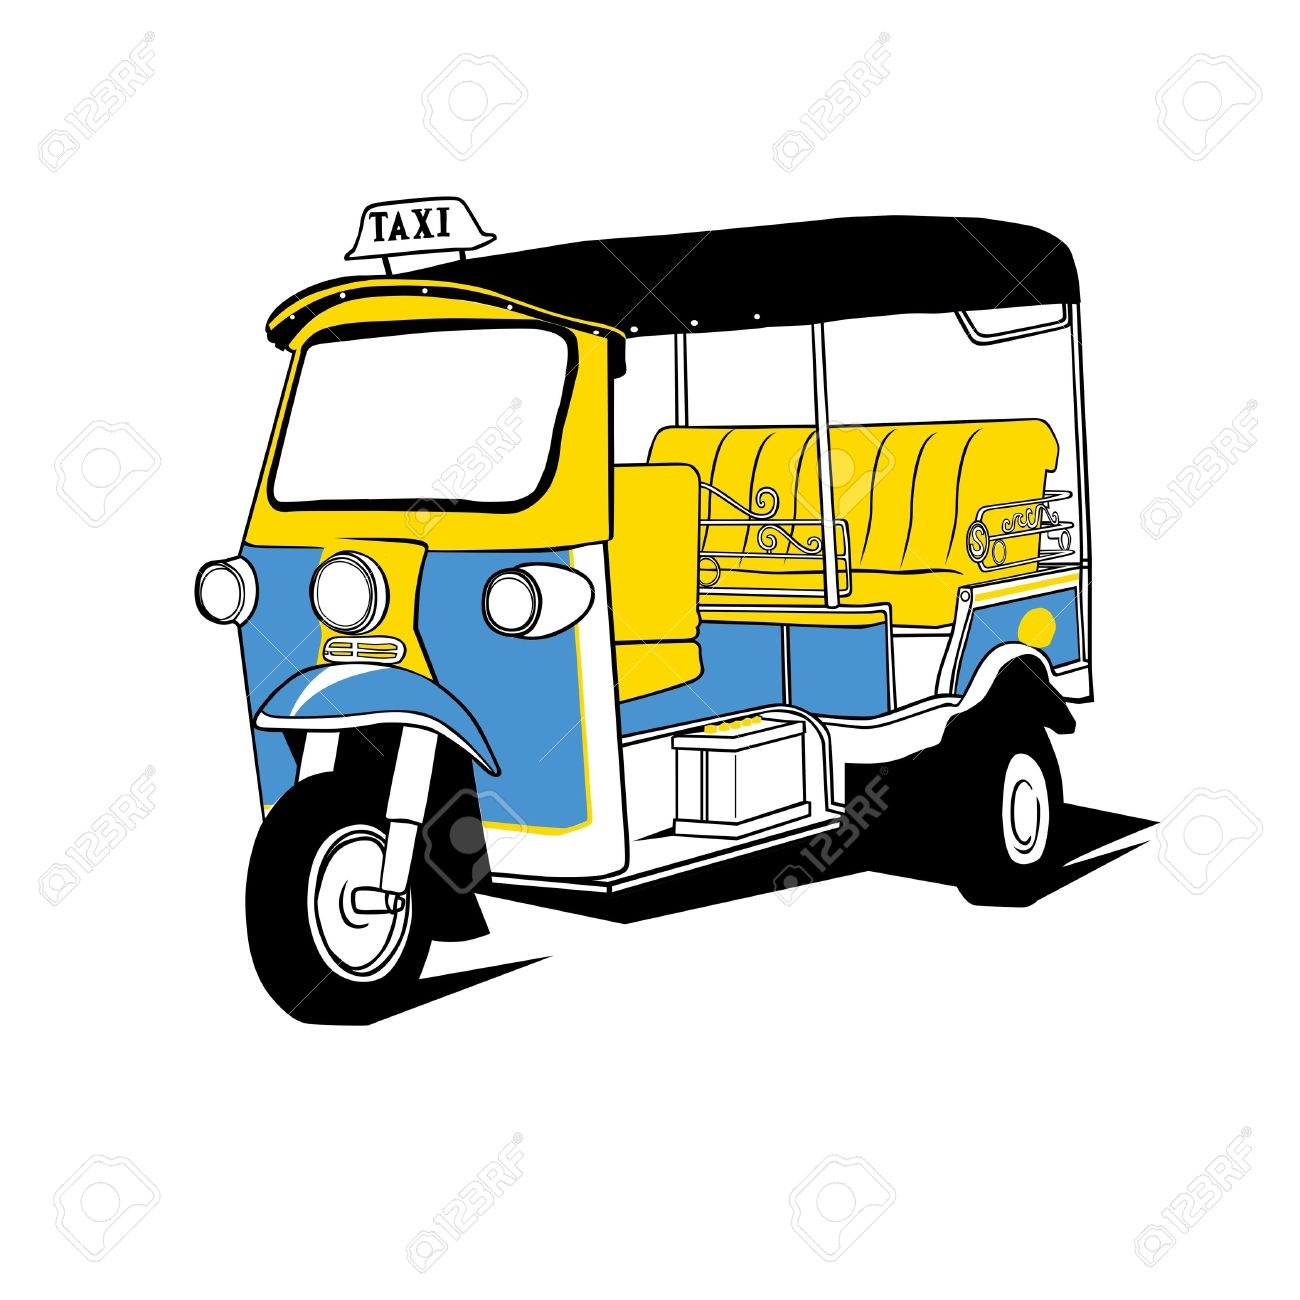 Tuktuk Taxi Thailand Royalty Free Cliparts, Vectors, And Stock.